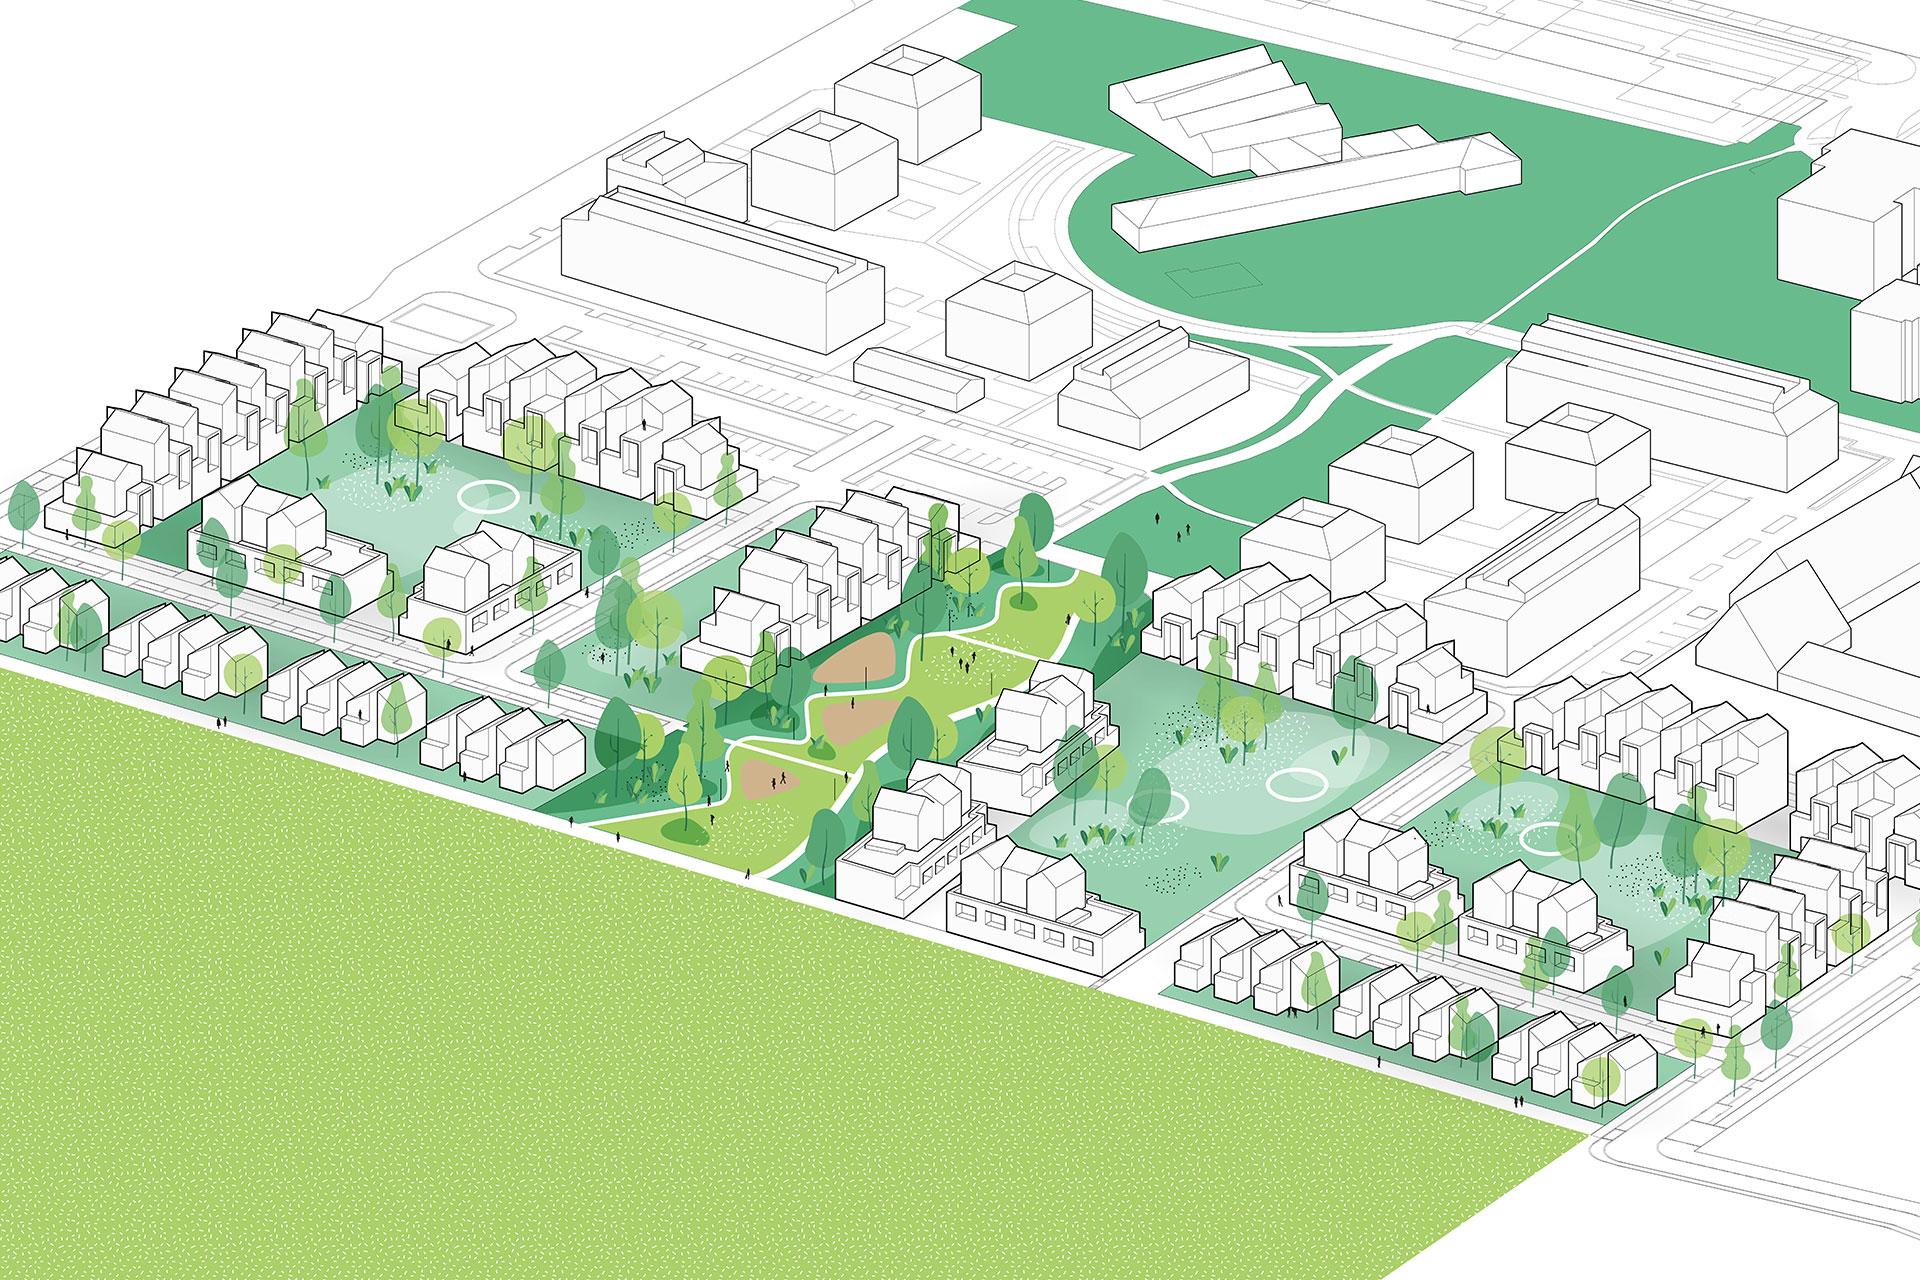 Saa Architectes Urbanisme Etudeurbaine Mitrymory05